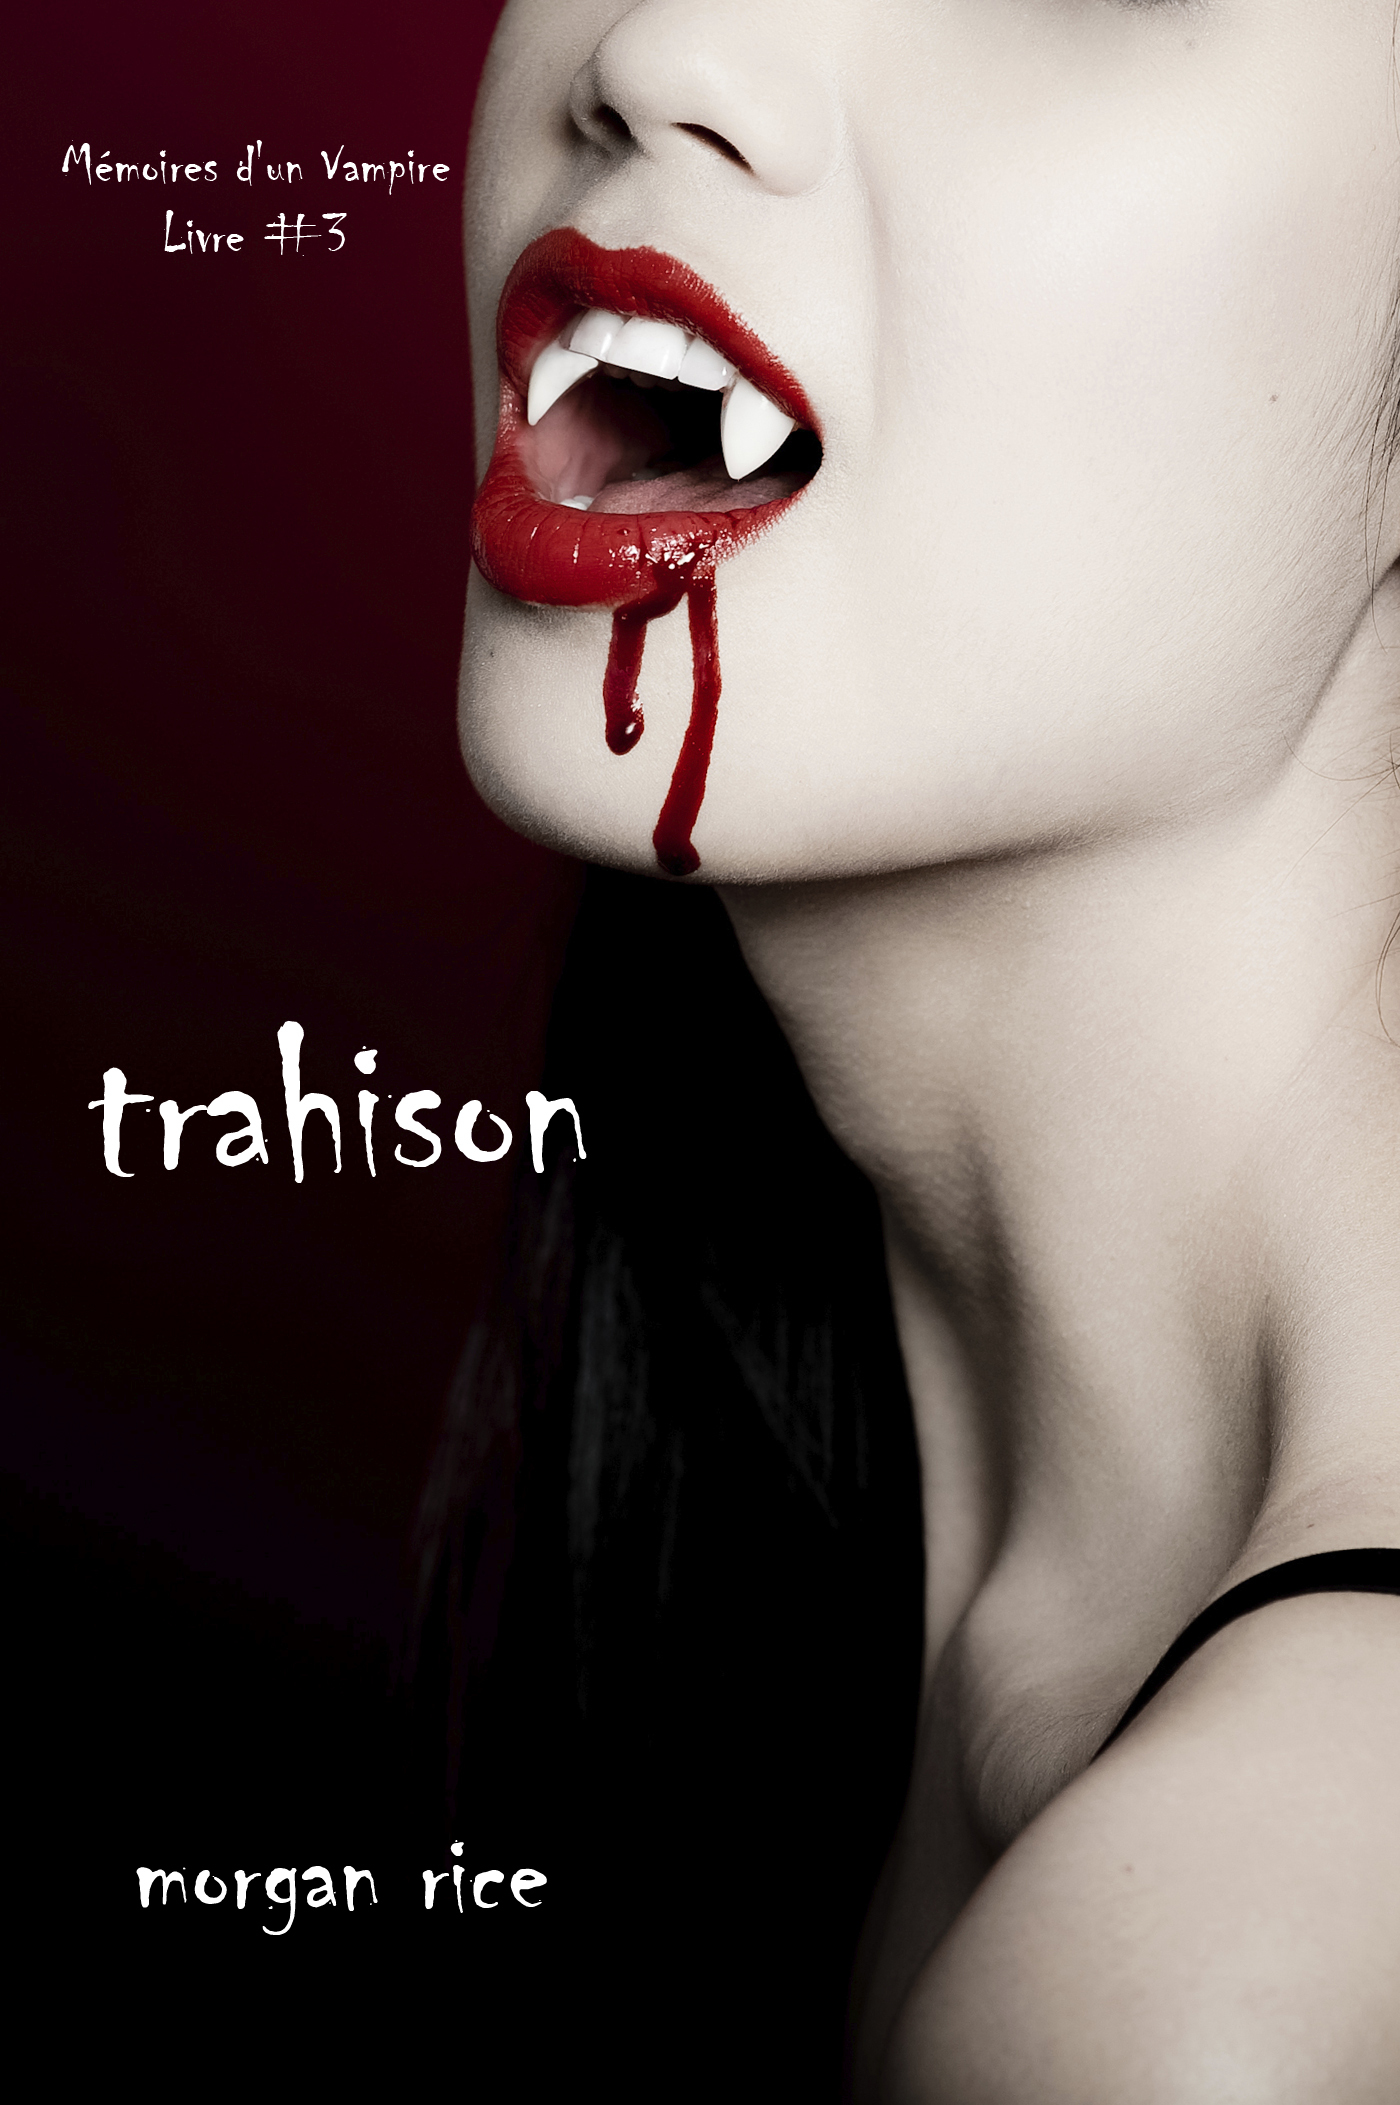 TRAHISON (LIVRE #3 MEMOIRES D